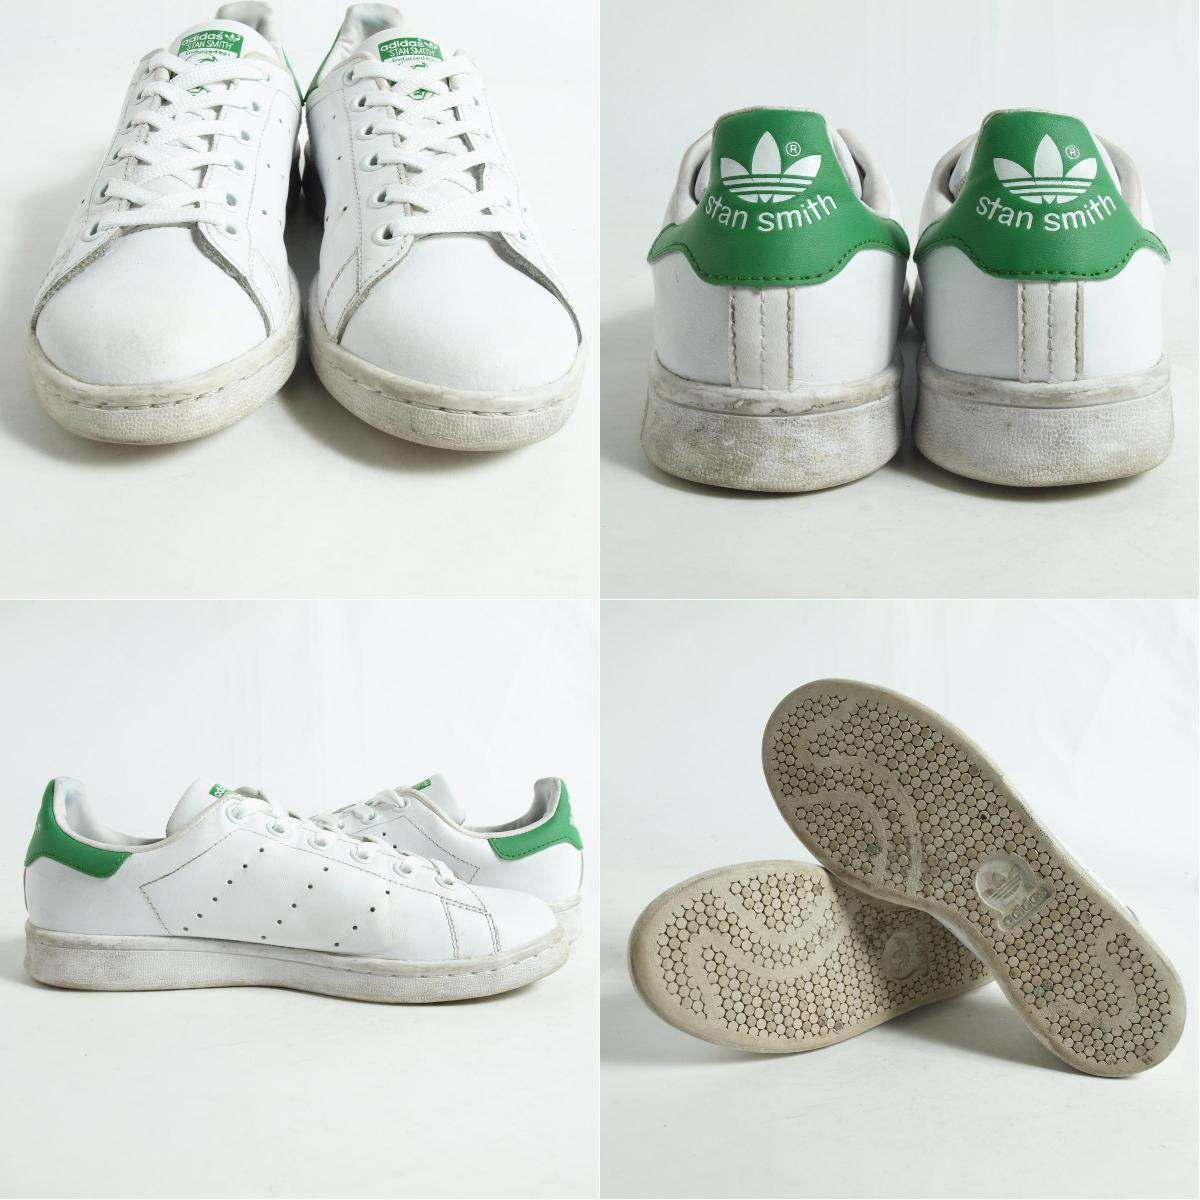 阿迪达斯STAN SMITH Stan Smith运动鞋US5女士23.5cm adidas/bok6682